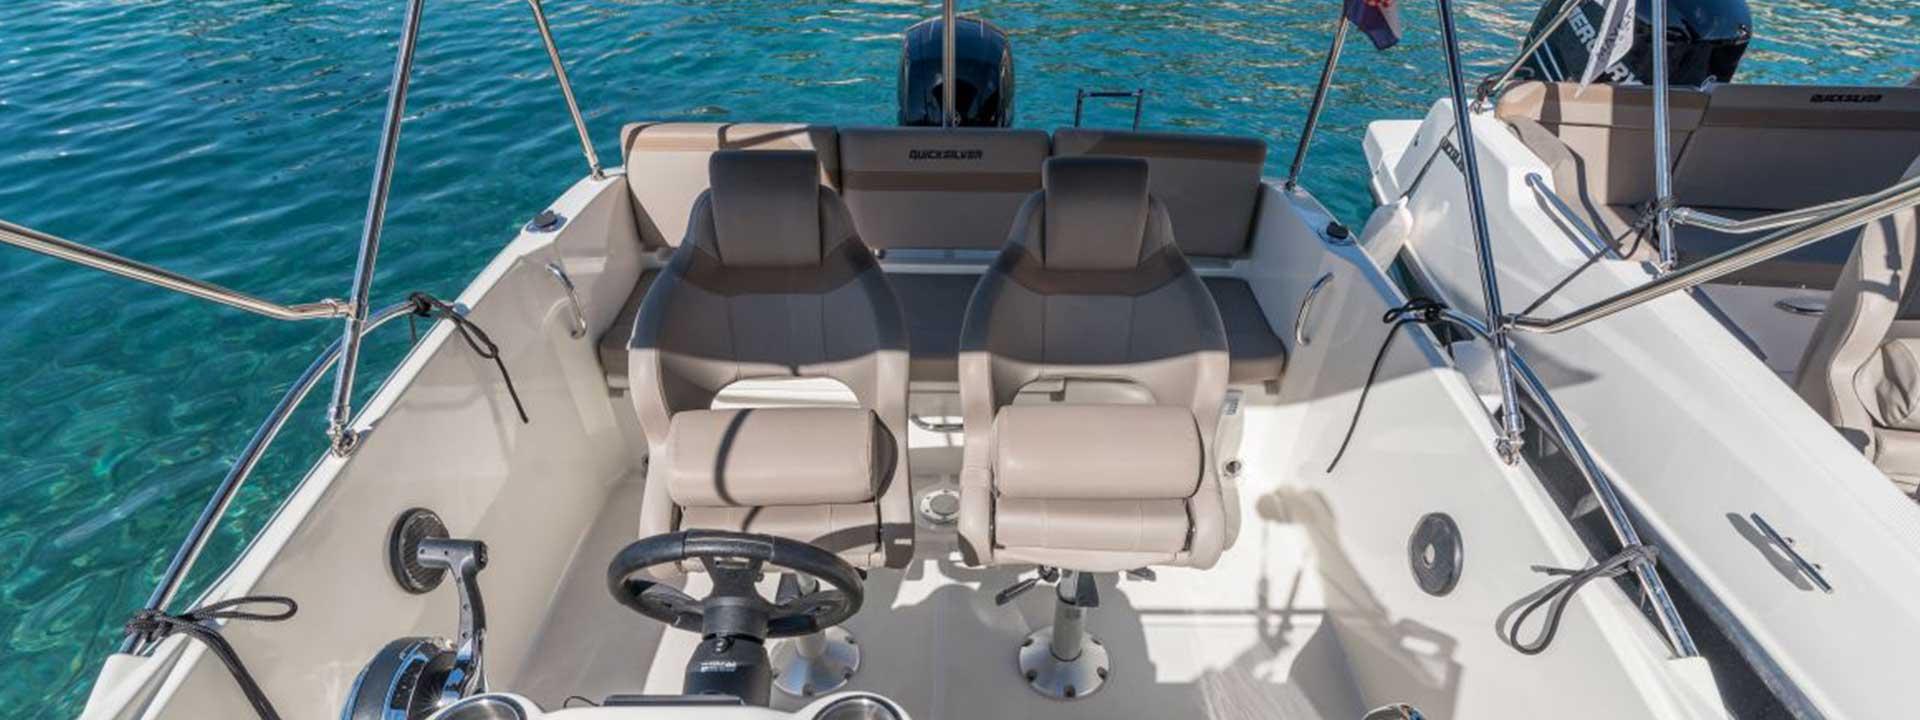 mayer-charter-boat-header-quicksilver-activ-675-open-03